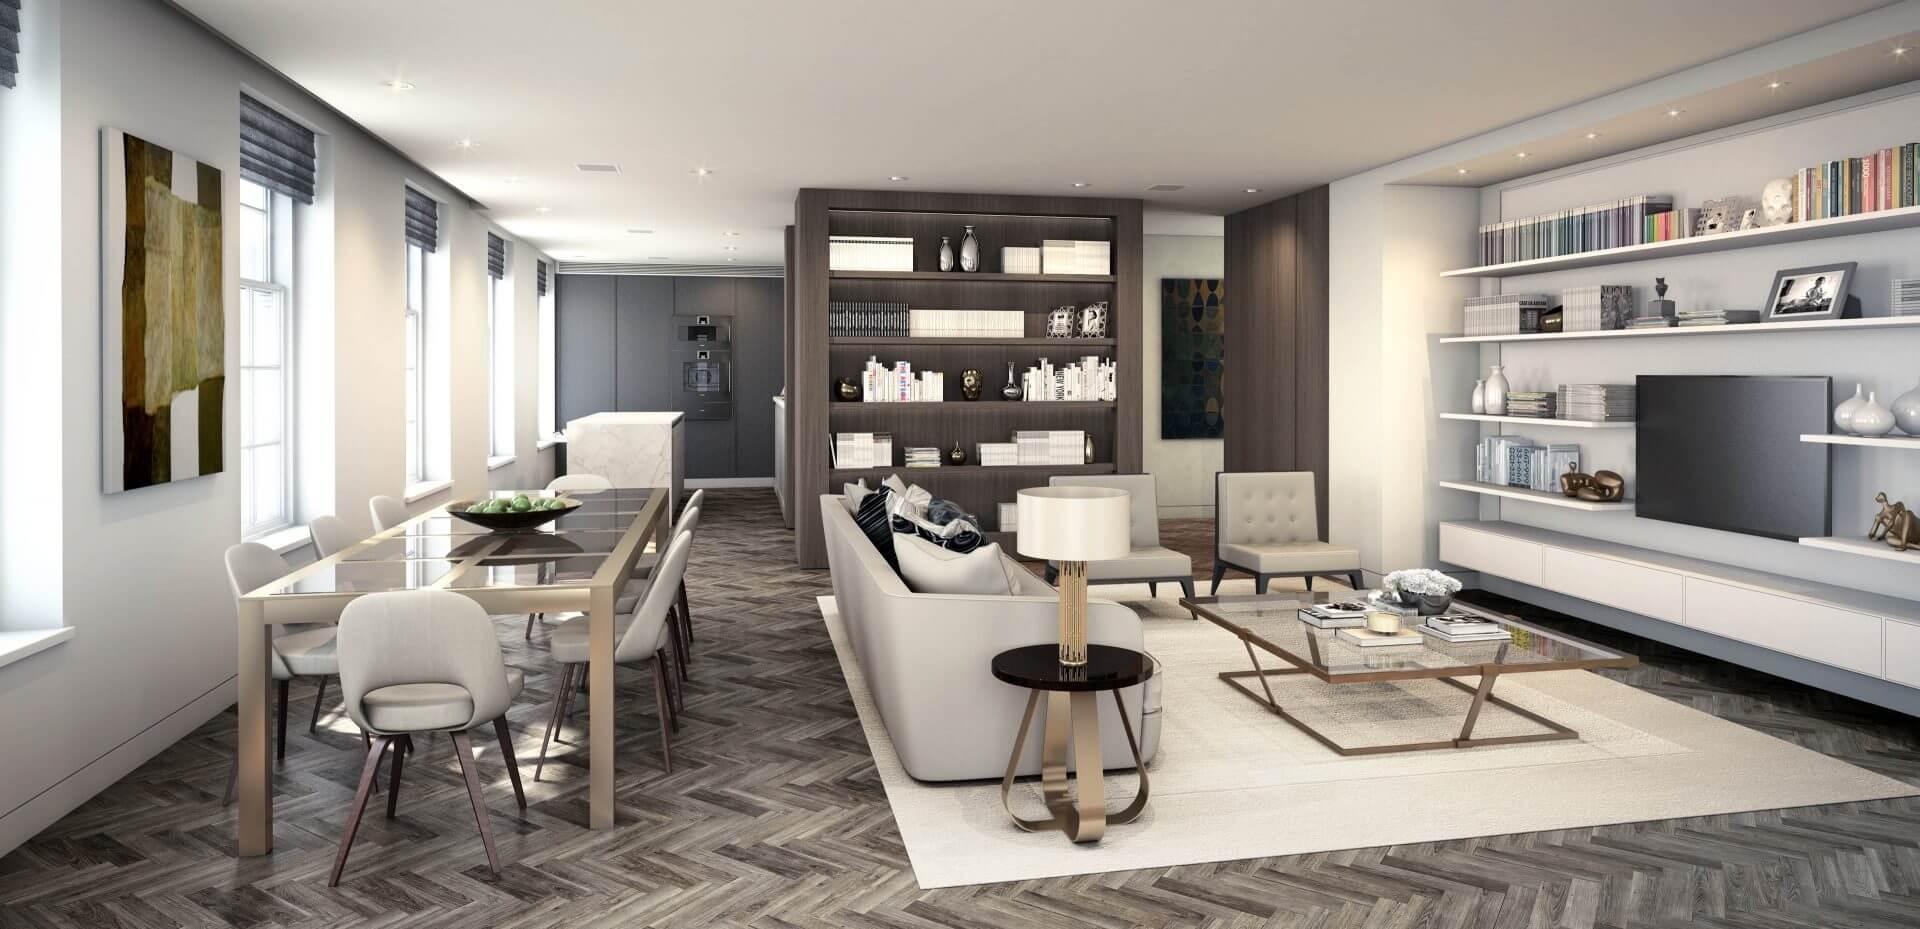 London penthouse visualisation for Devonshire Properties